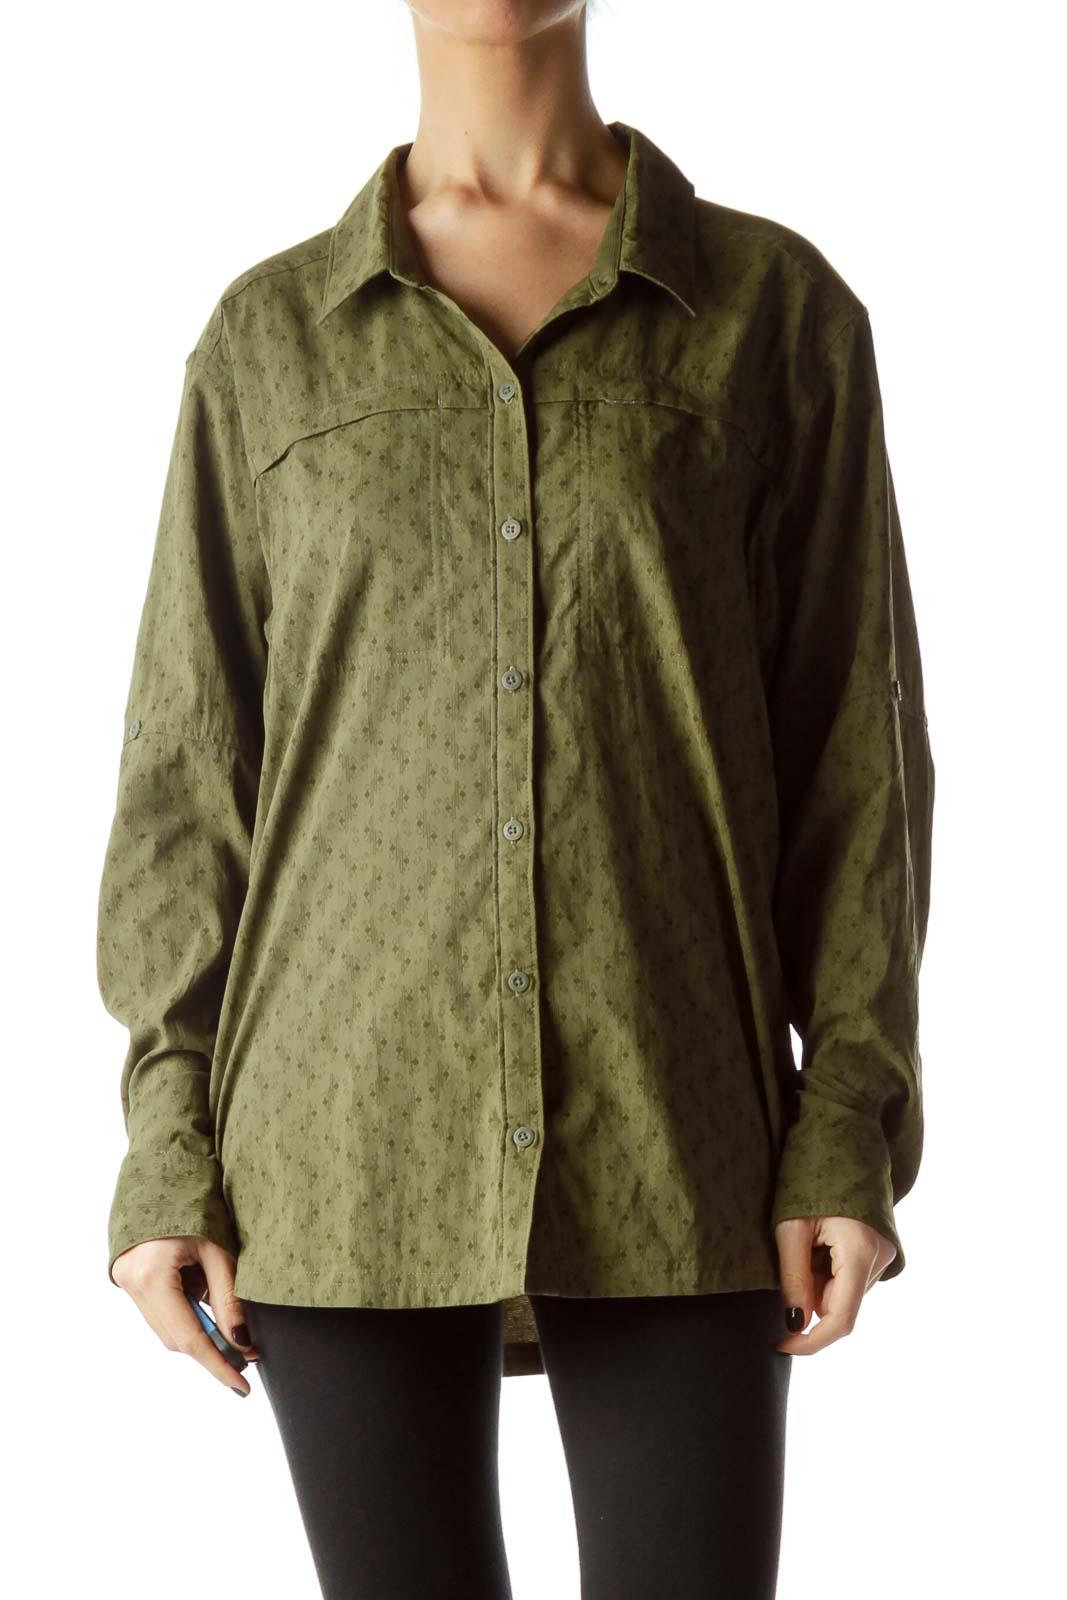 Army Green Small Geometric Print Shirt Front